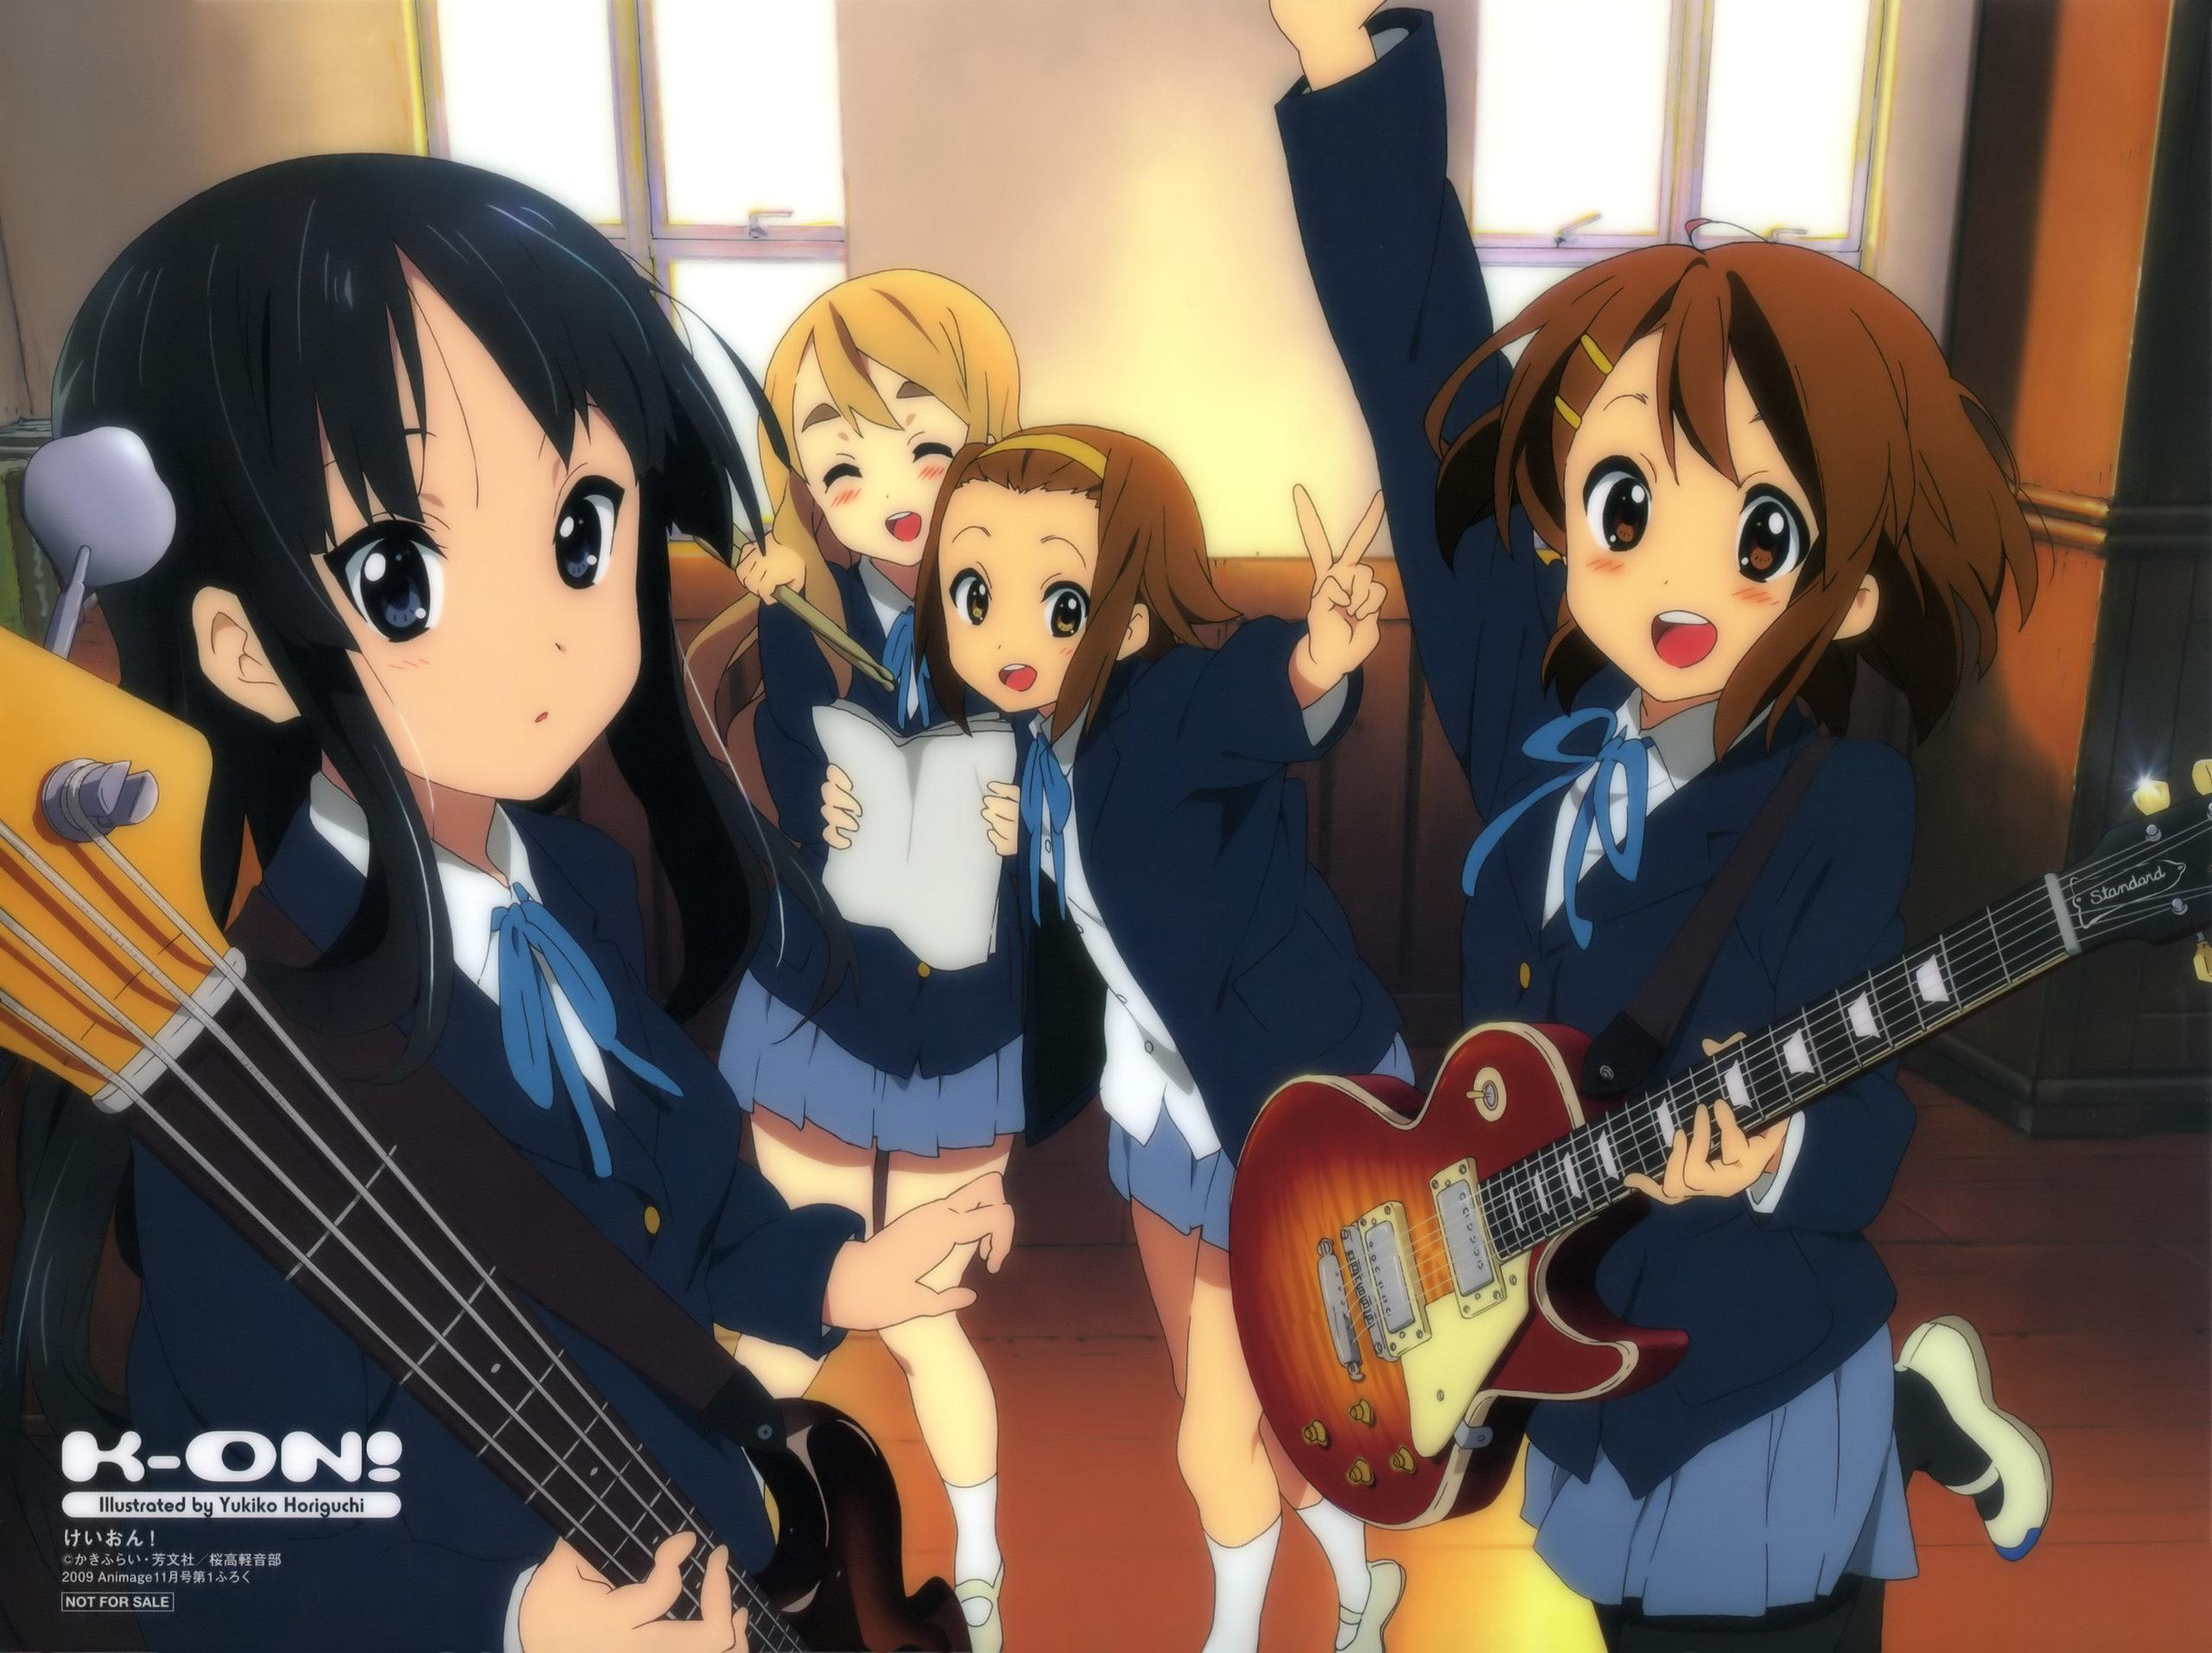 anime music images k - photo #7